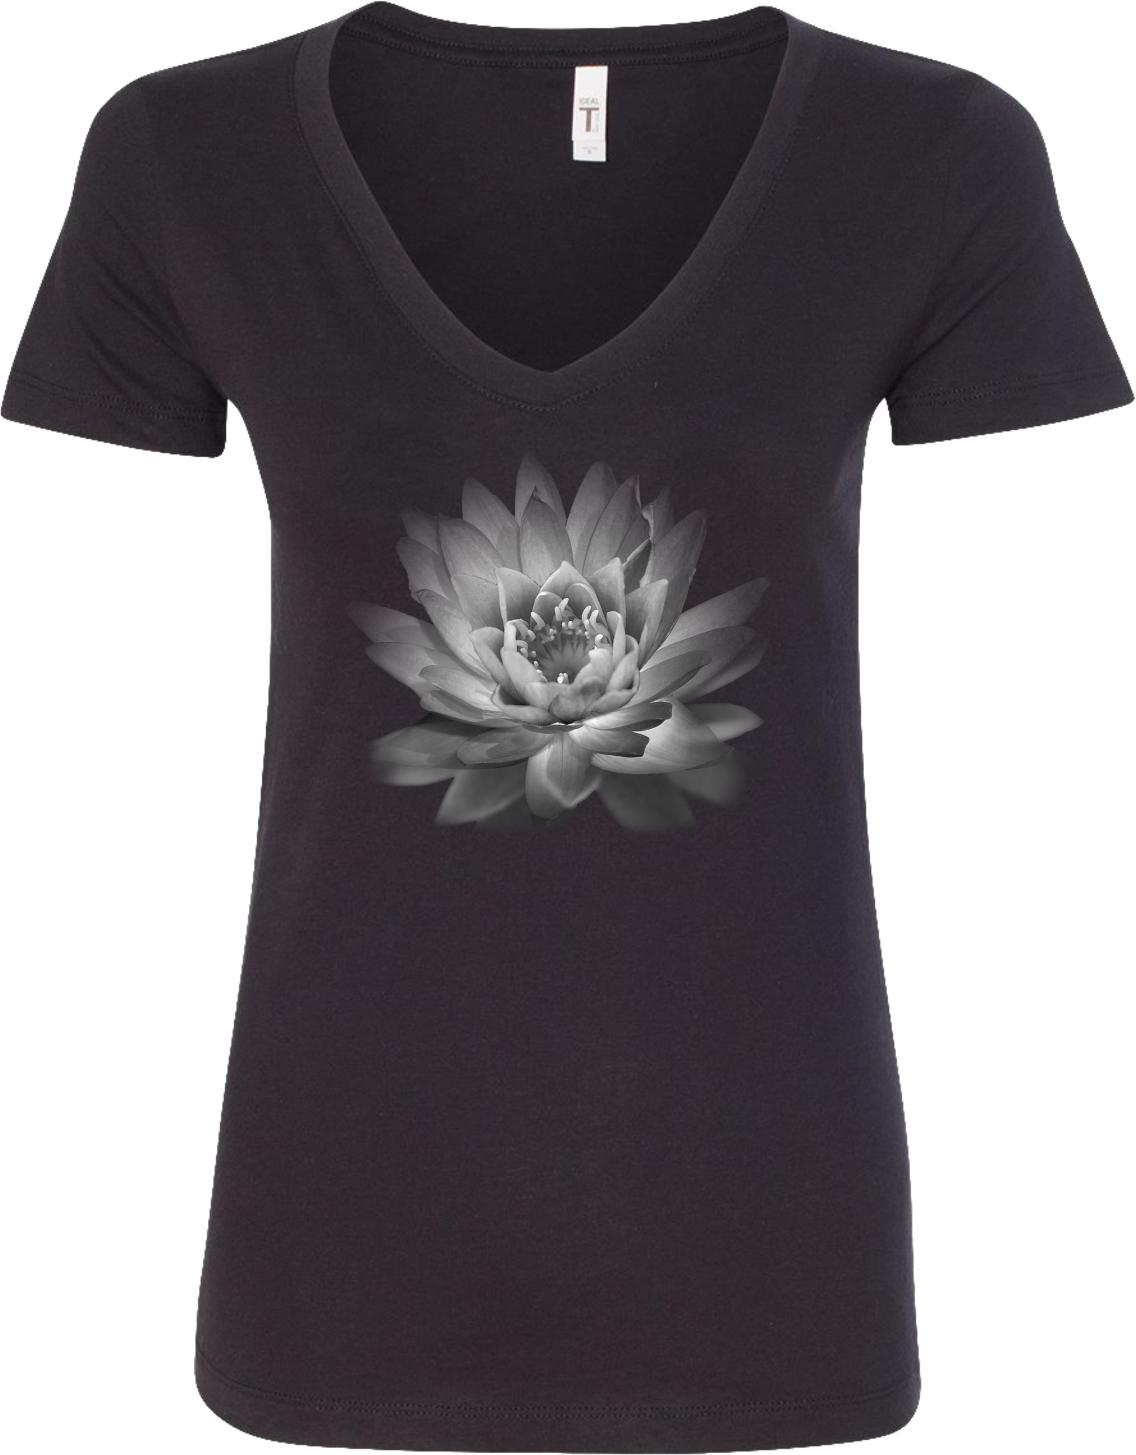 Yoga Clothing For You Lotus Flower Ideal V Neck Yoga Tee Shirt Ebay